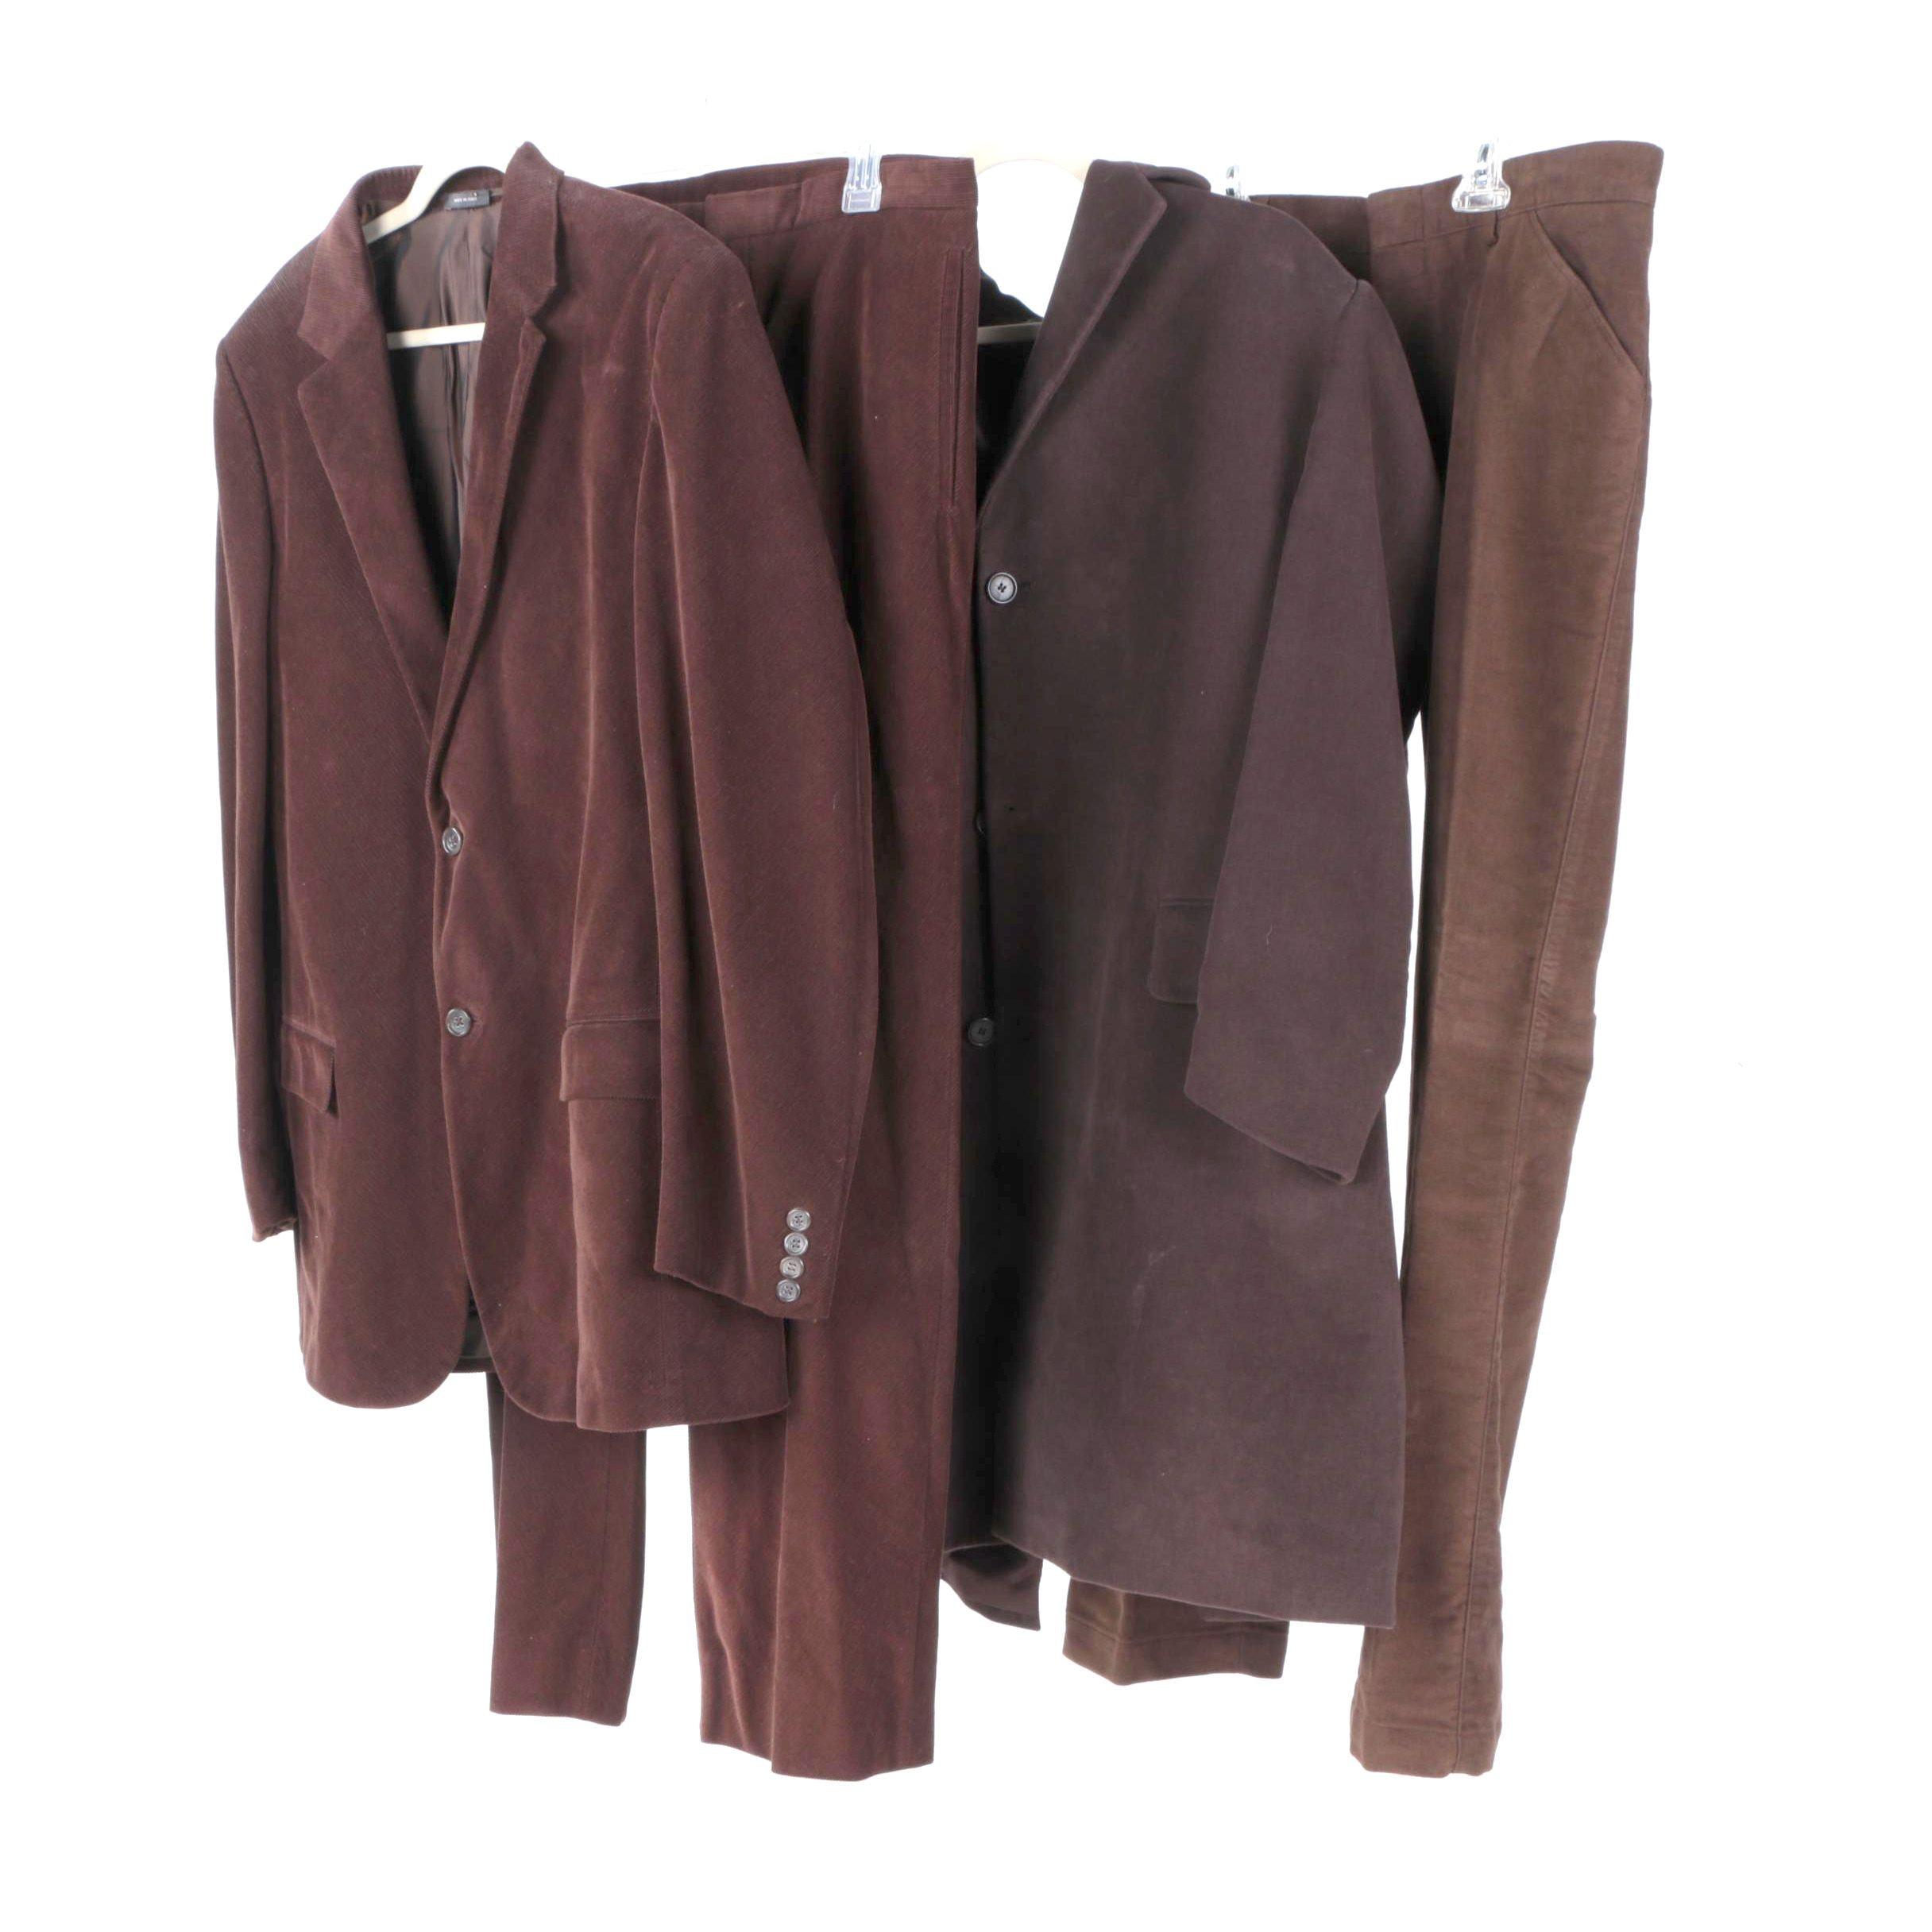 Men's Clothing Items Including Jil Sander Suit